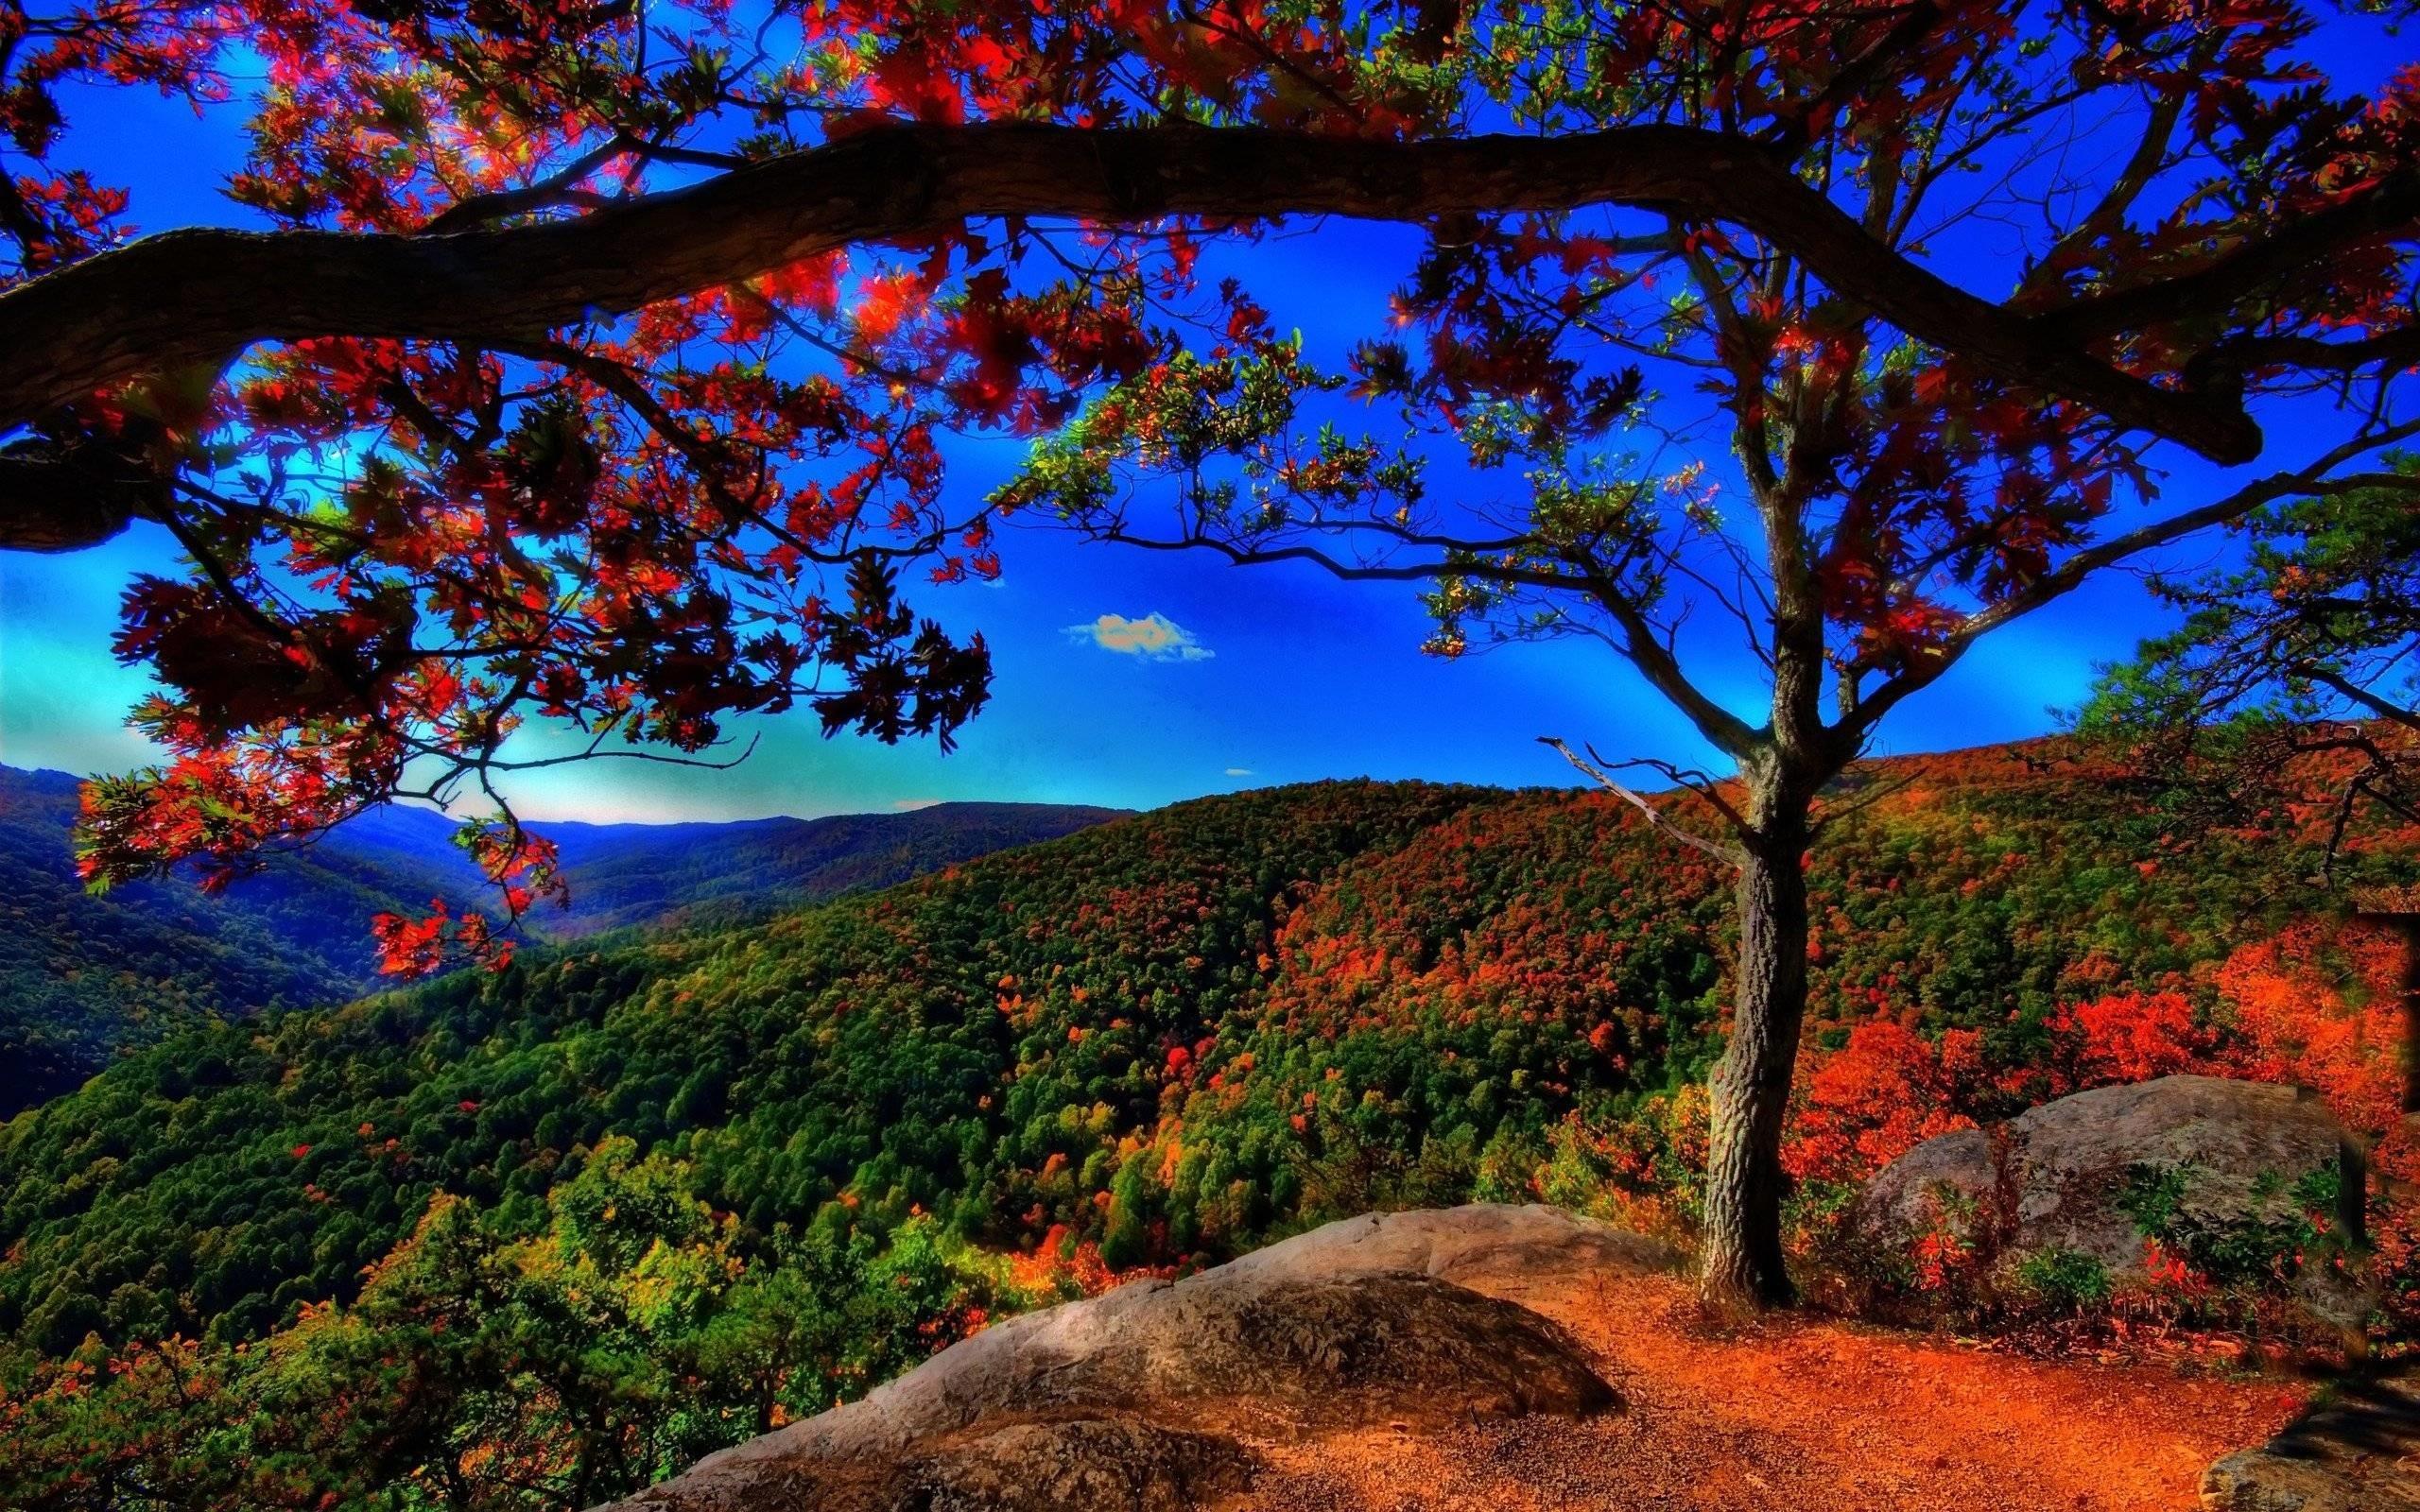 beautiful nature scenery wallpaper (56+ images)